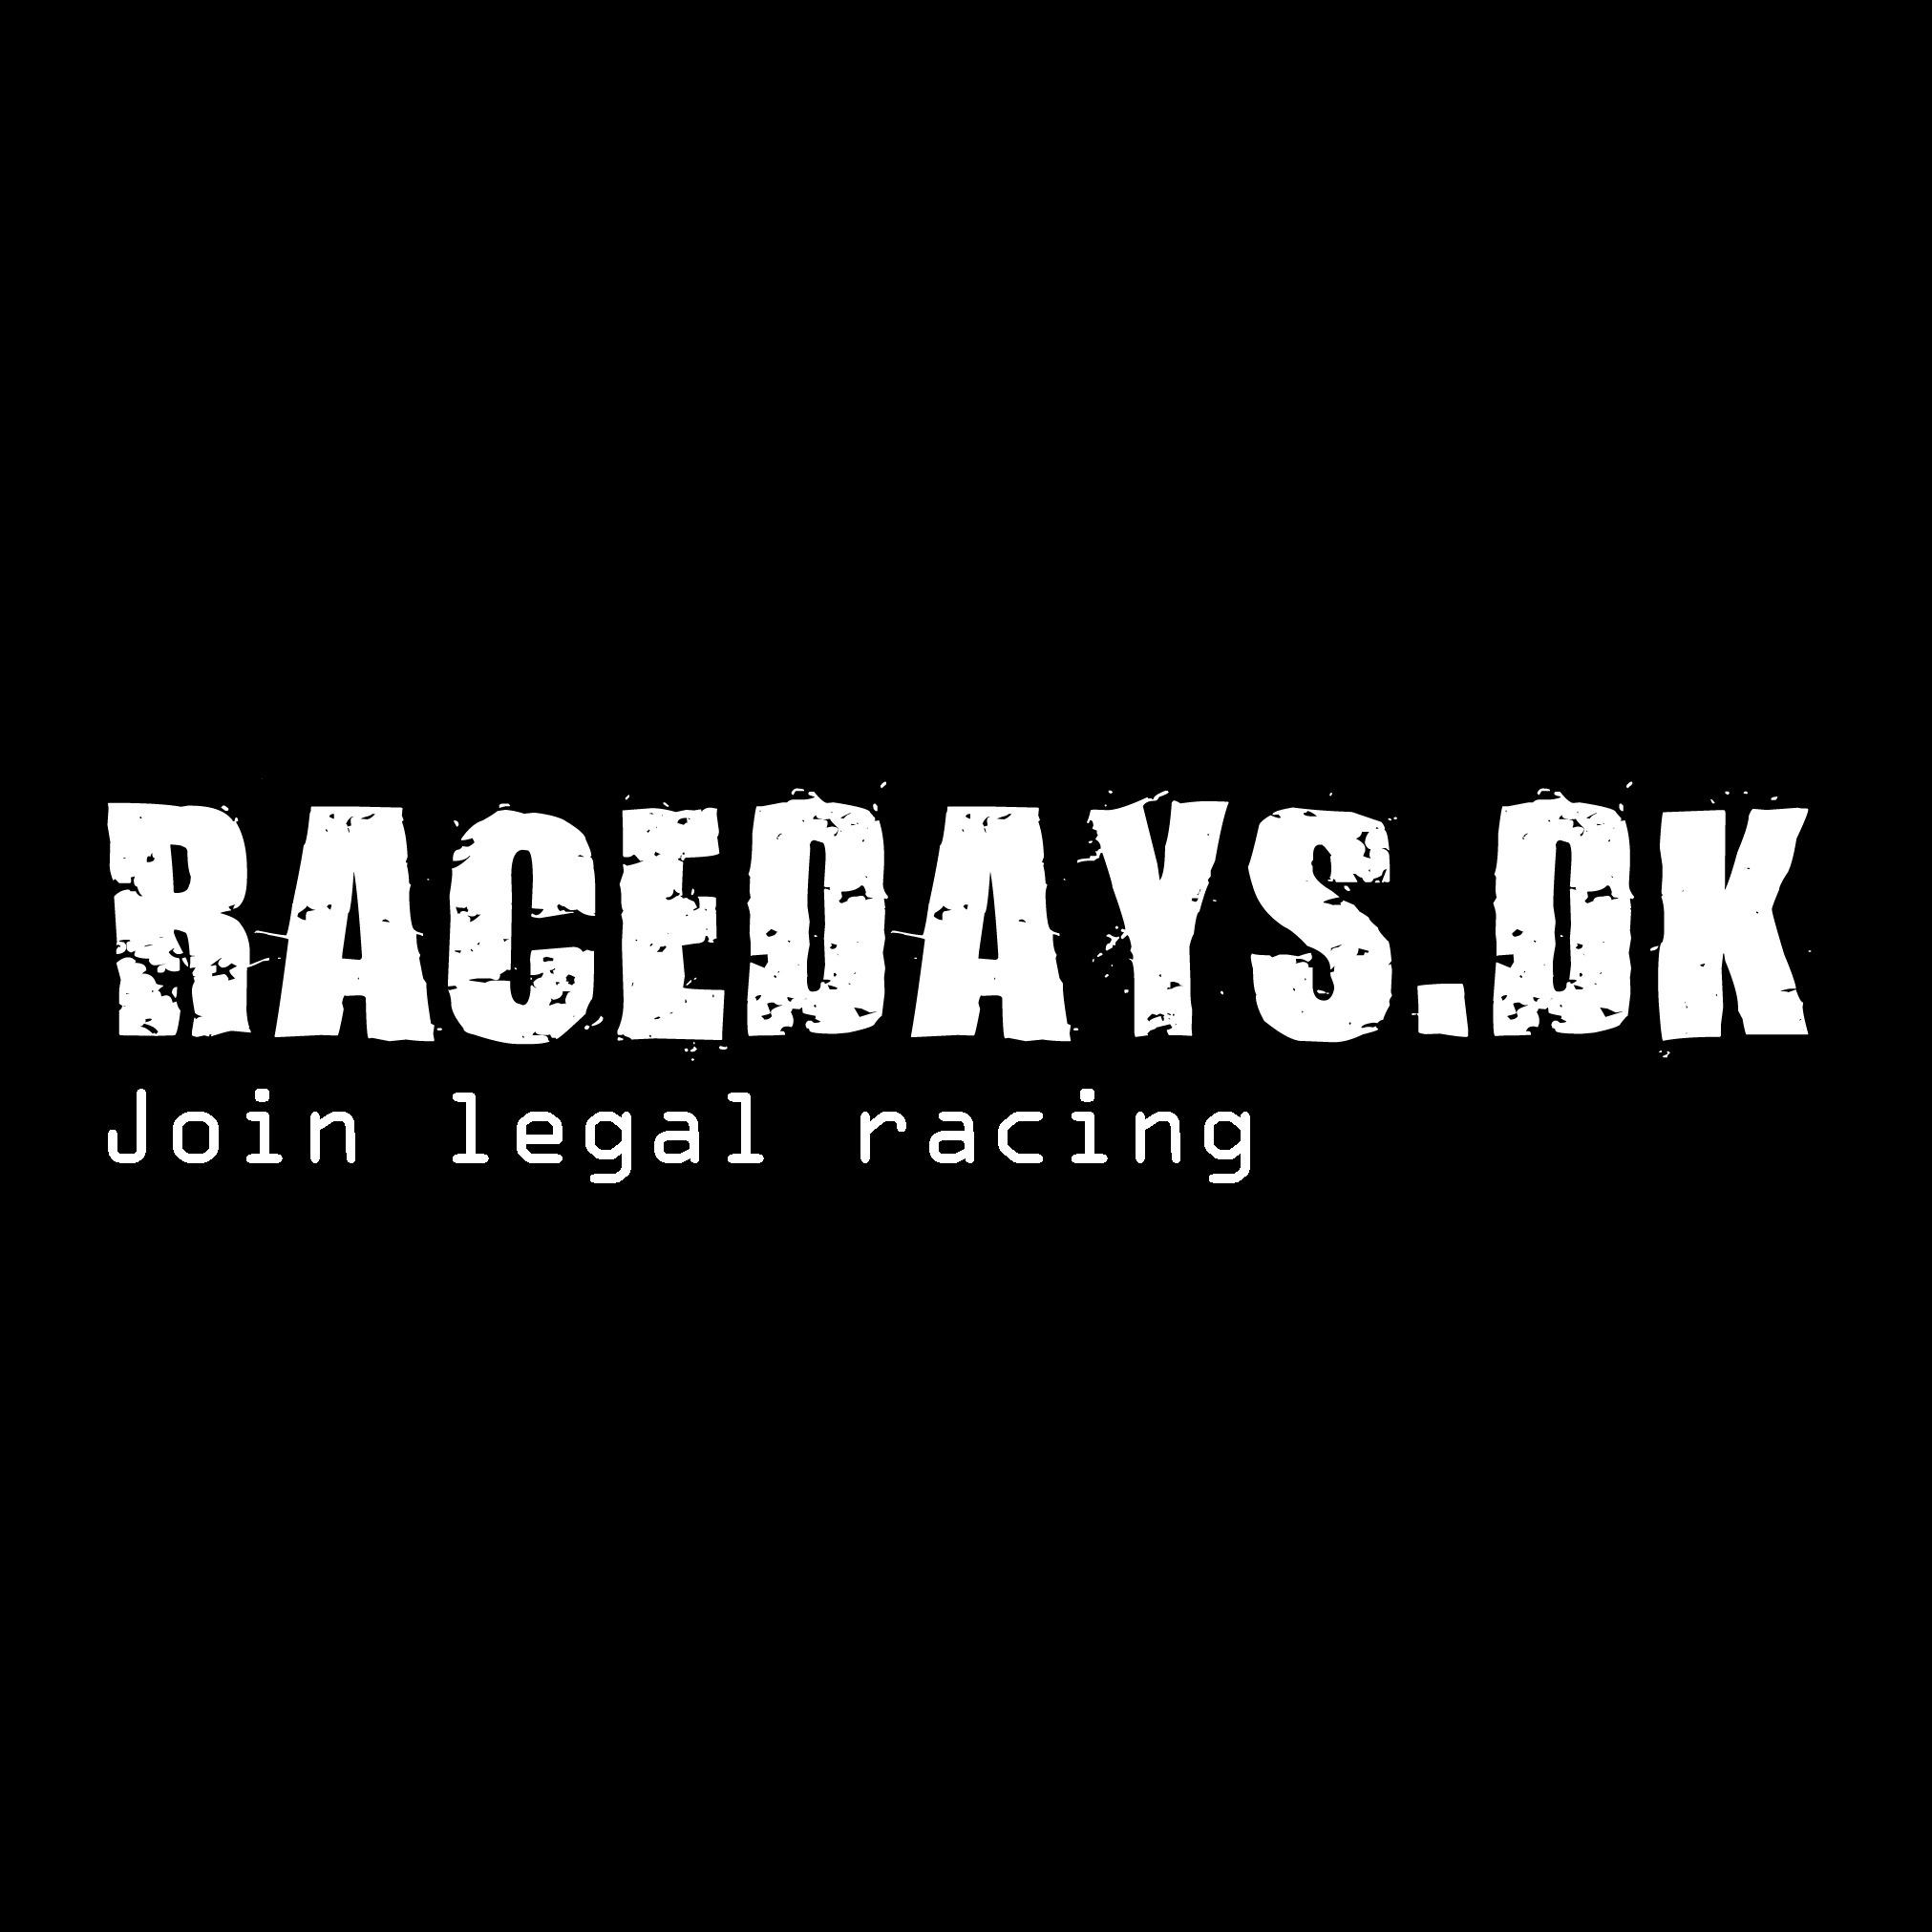 Racedays.dk | Odense Raceway 2018 #1